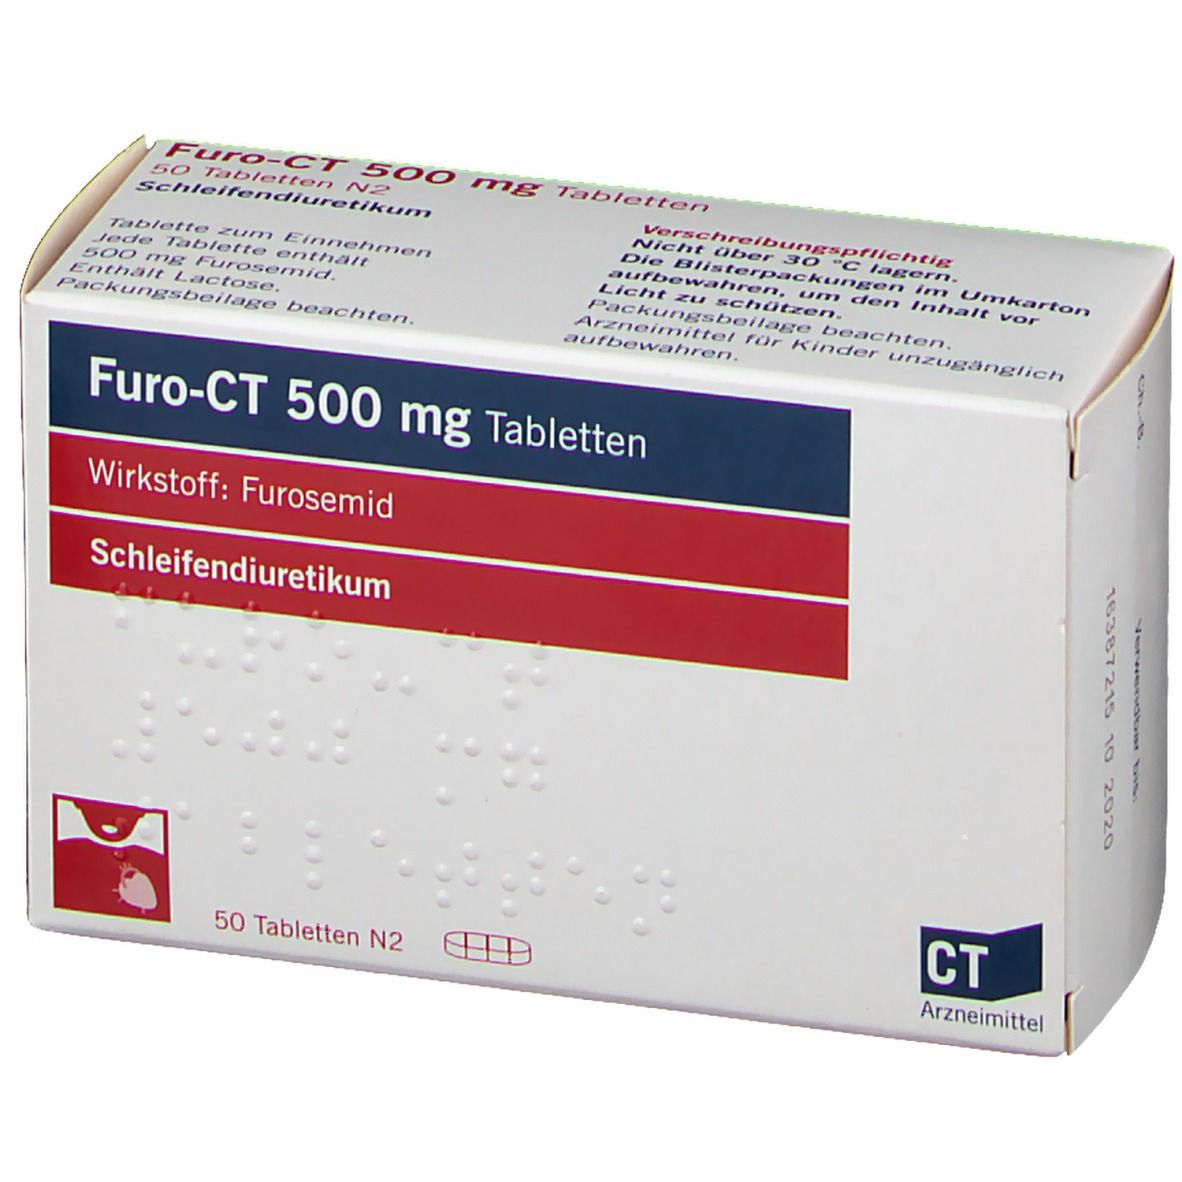 Furo-ct 500 mg Tabletten